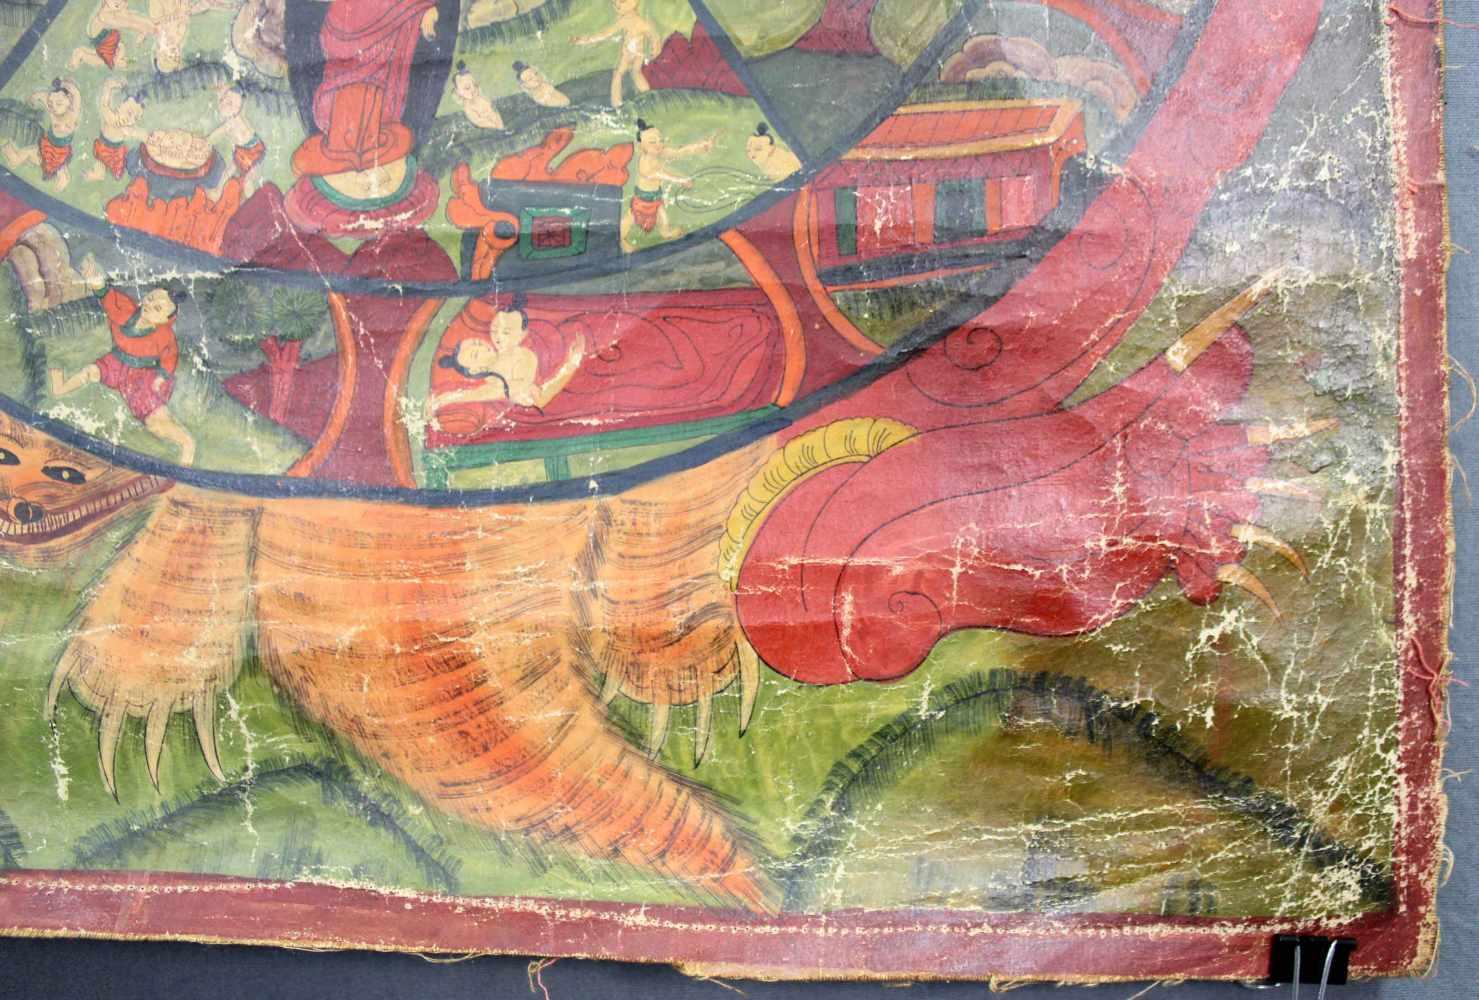 Lot 47 - Bhavacakra Mandala, China / Tibet alt.65 cm x 47 cm. Gemälde. Lebensrad Mandala mit 6 Buddhas. Im